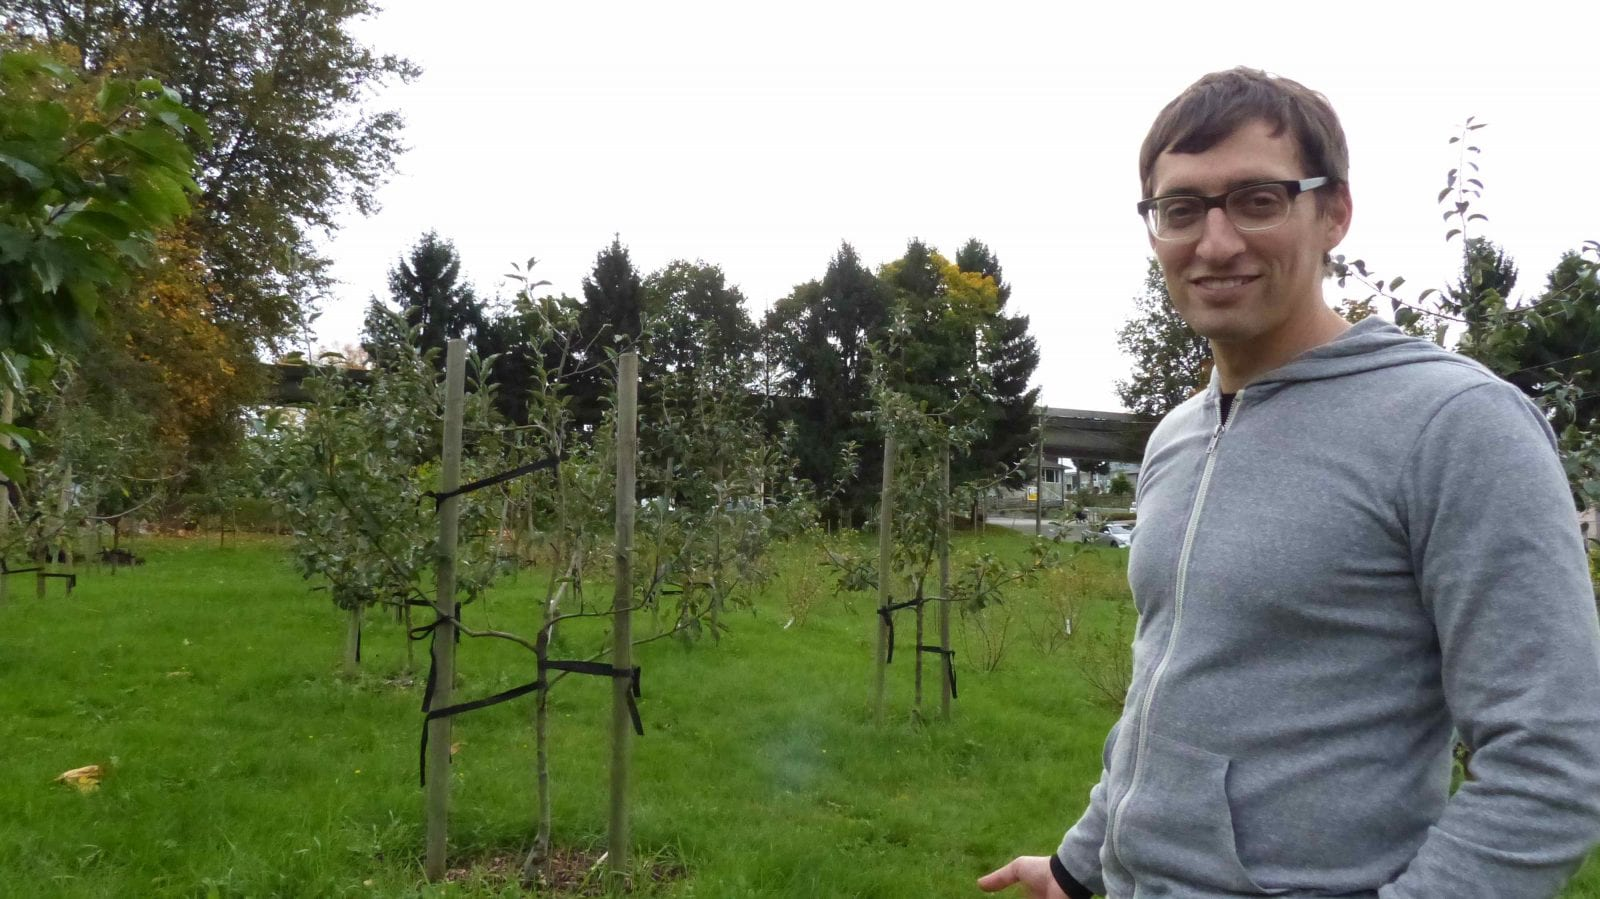 Copley Community Orchard, Vancouver, B.C.